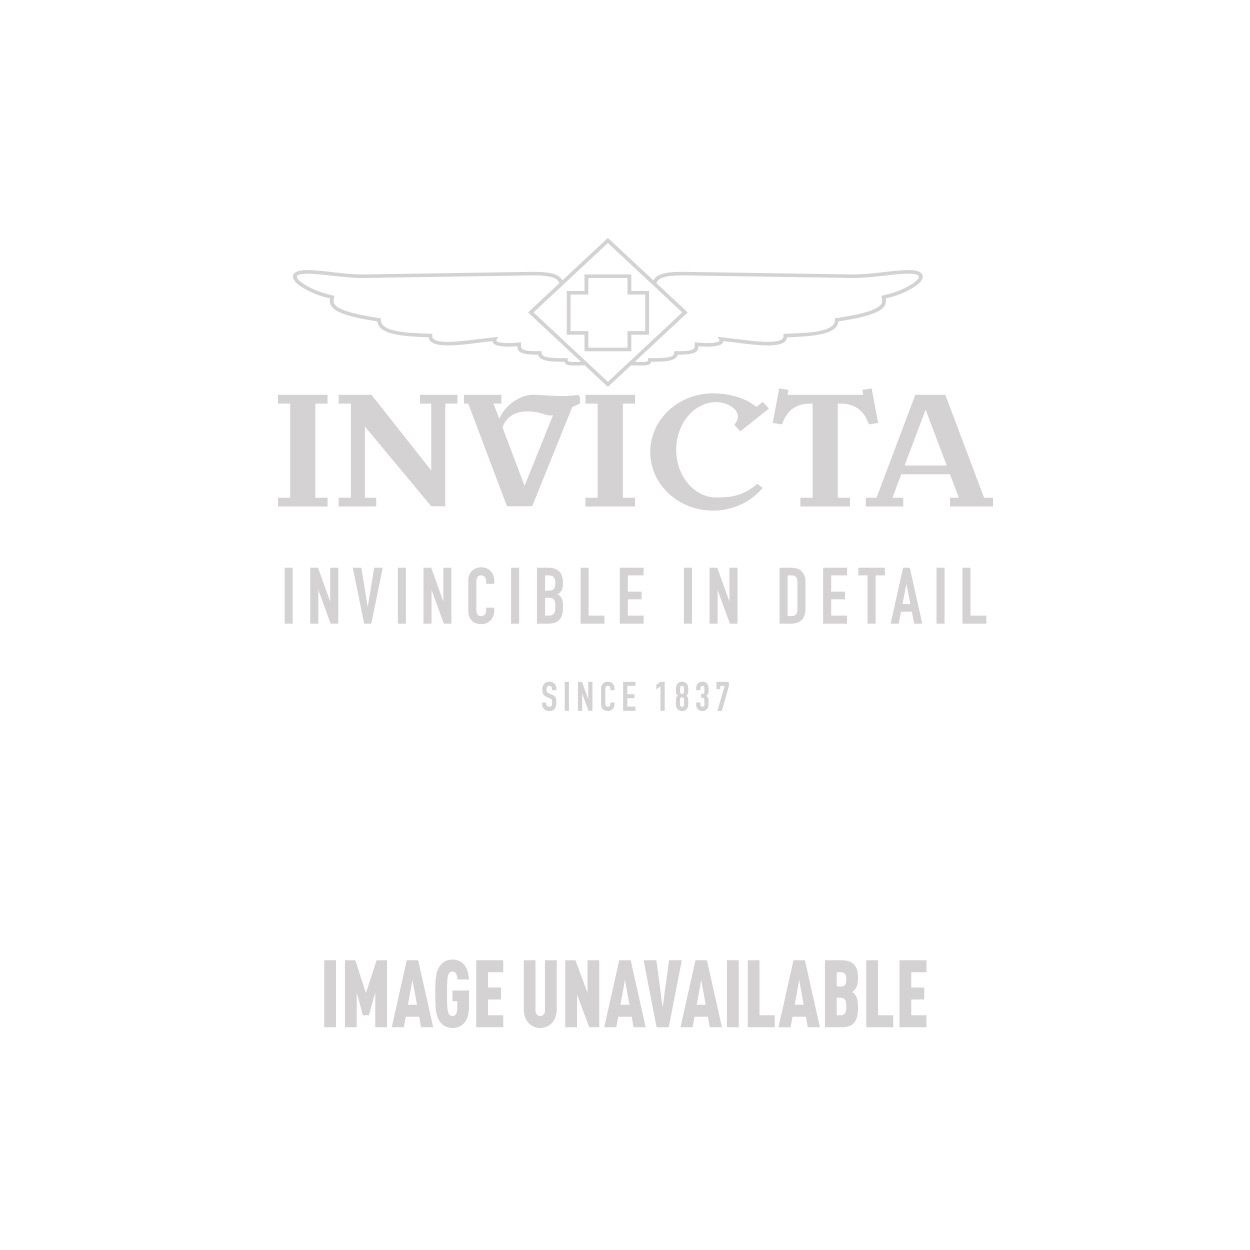 INVICTA Jewelry DORINN Bracelets 21 7 Silver 925 Rhodium+White - Model J0129